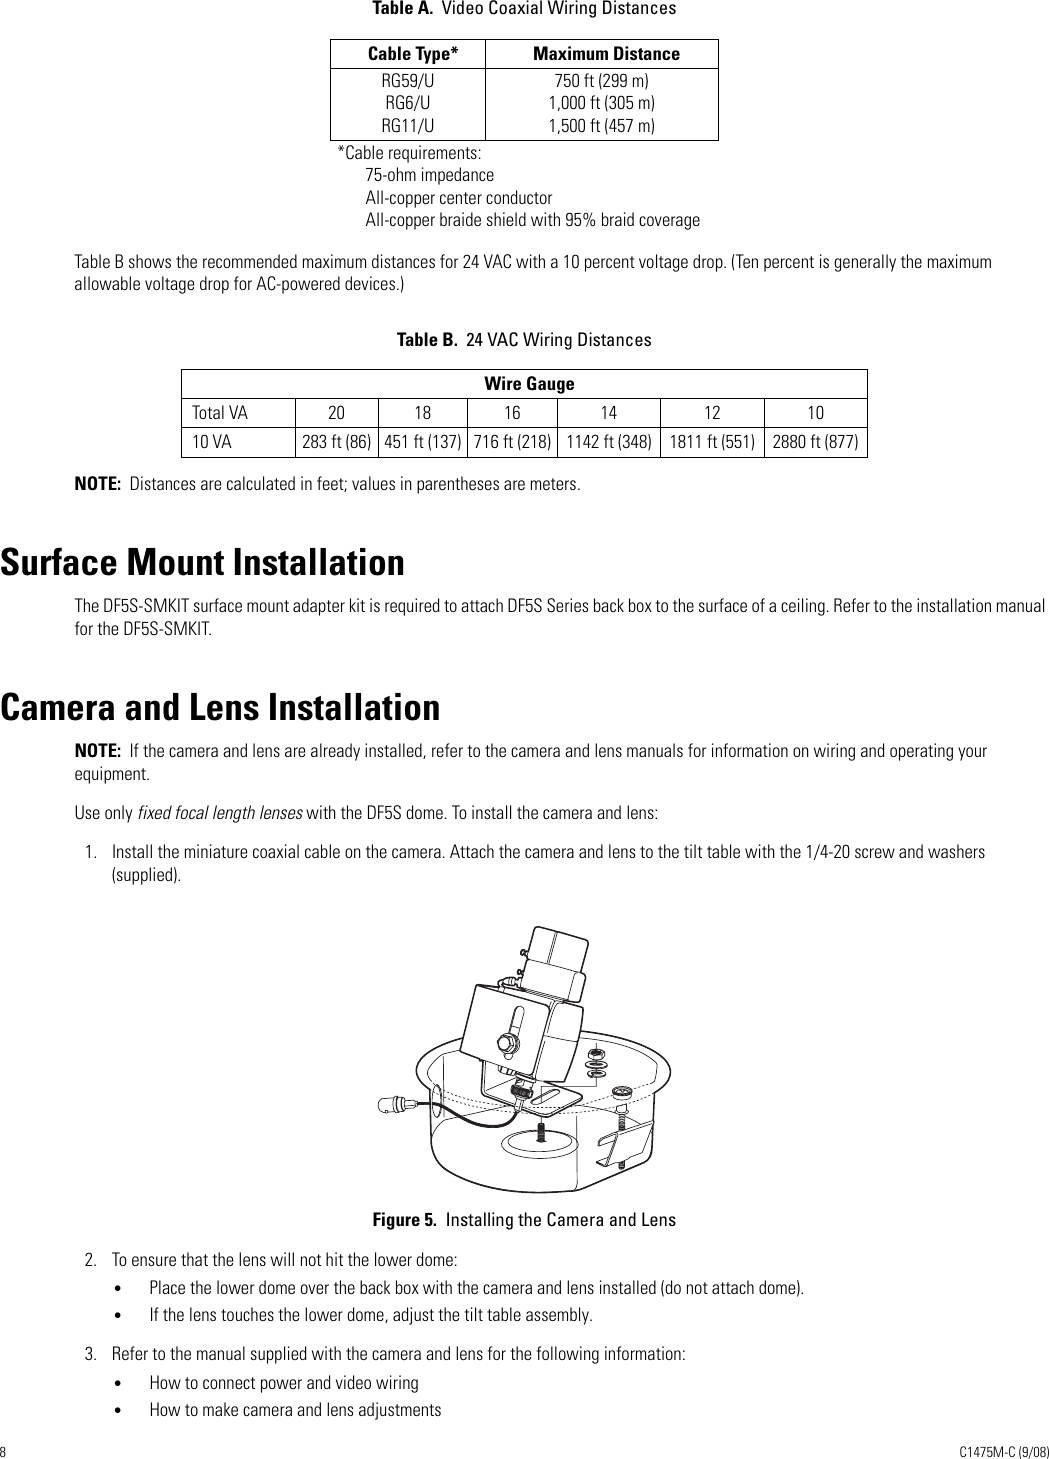 Pelco Security Camera C1475M C Users Manual ...